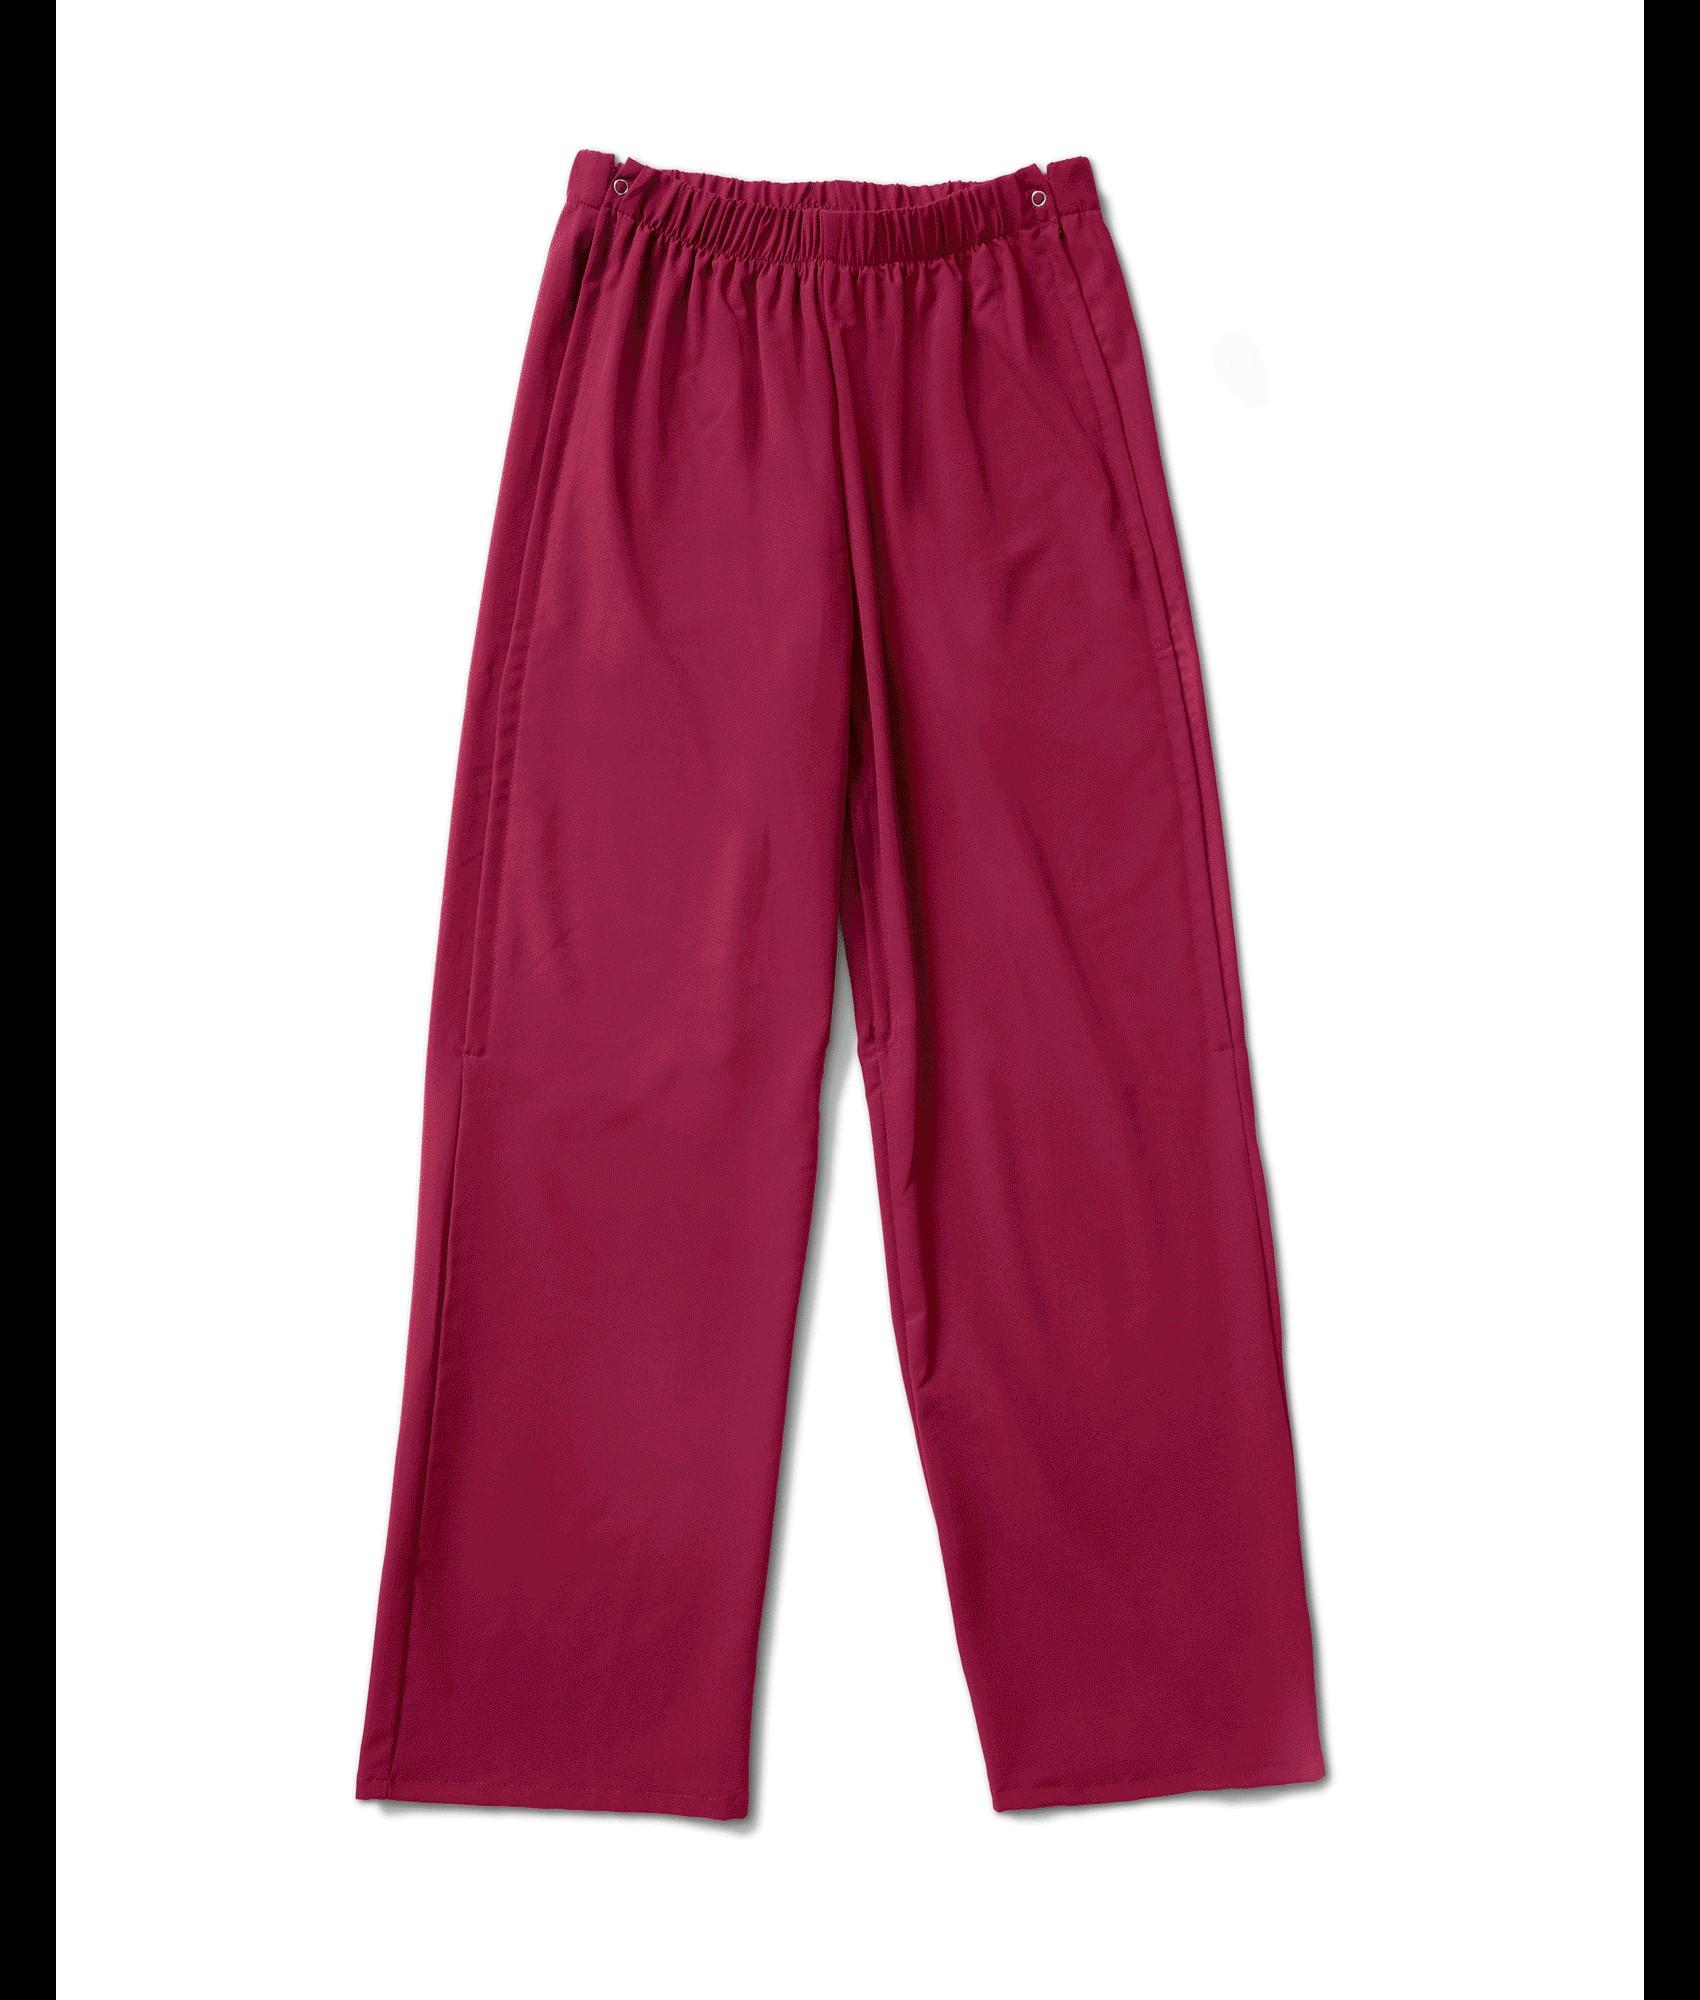 CareZips CareZips-46832-1240-2X Easy Change Trousers & Pants, Plumberry - 2XL